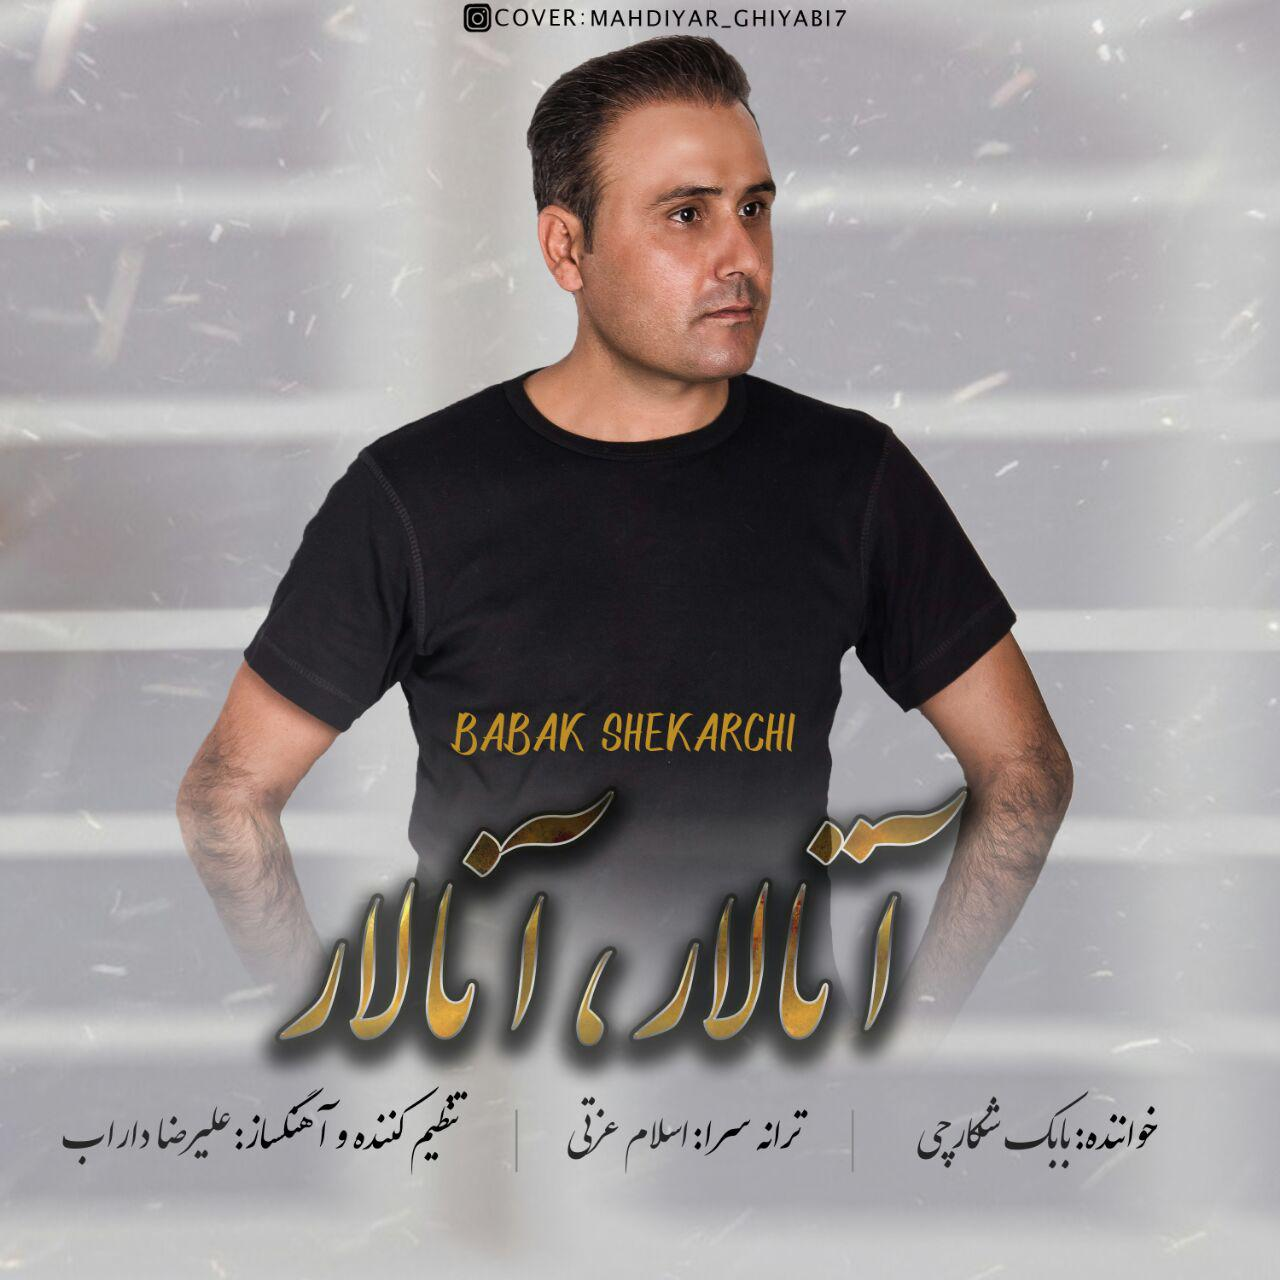 http://s9.picofile.com/file/8359029884/04Babak_Shekarchi_Atalar_Analar.jpg